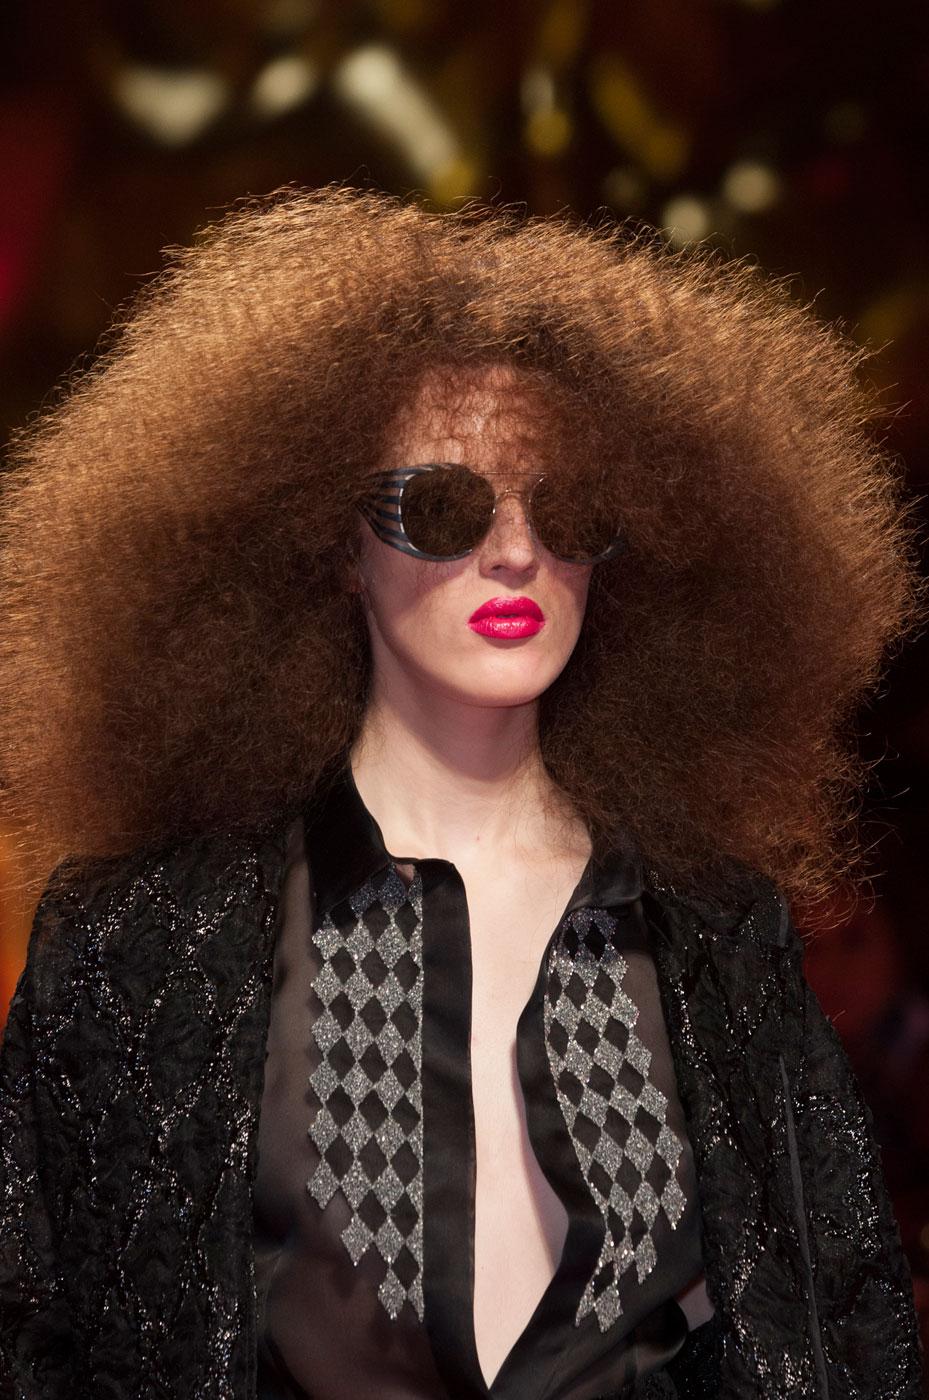 Schiaparelli-fashion-runway-show-close-ups-haute-couture-paris-spring-summer-2015-the-impression-26